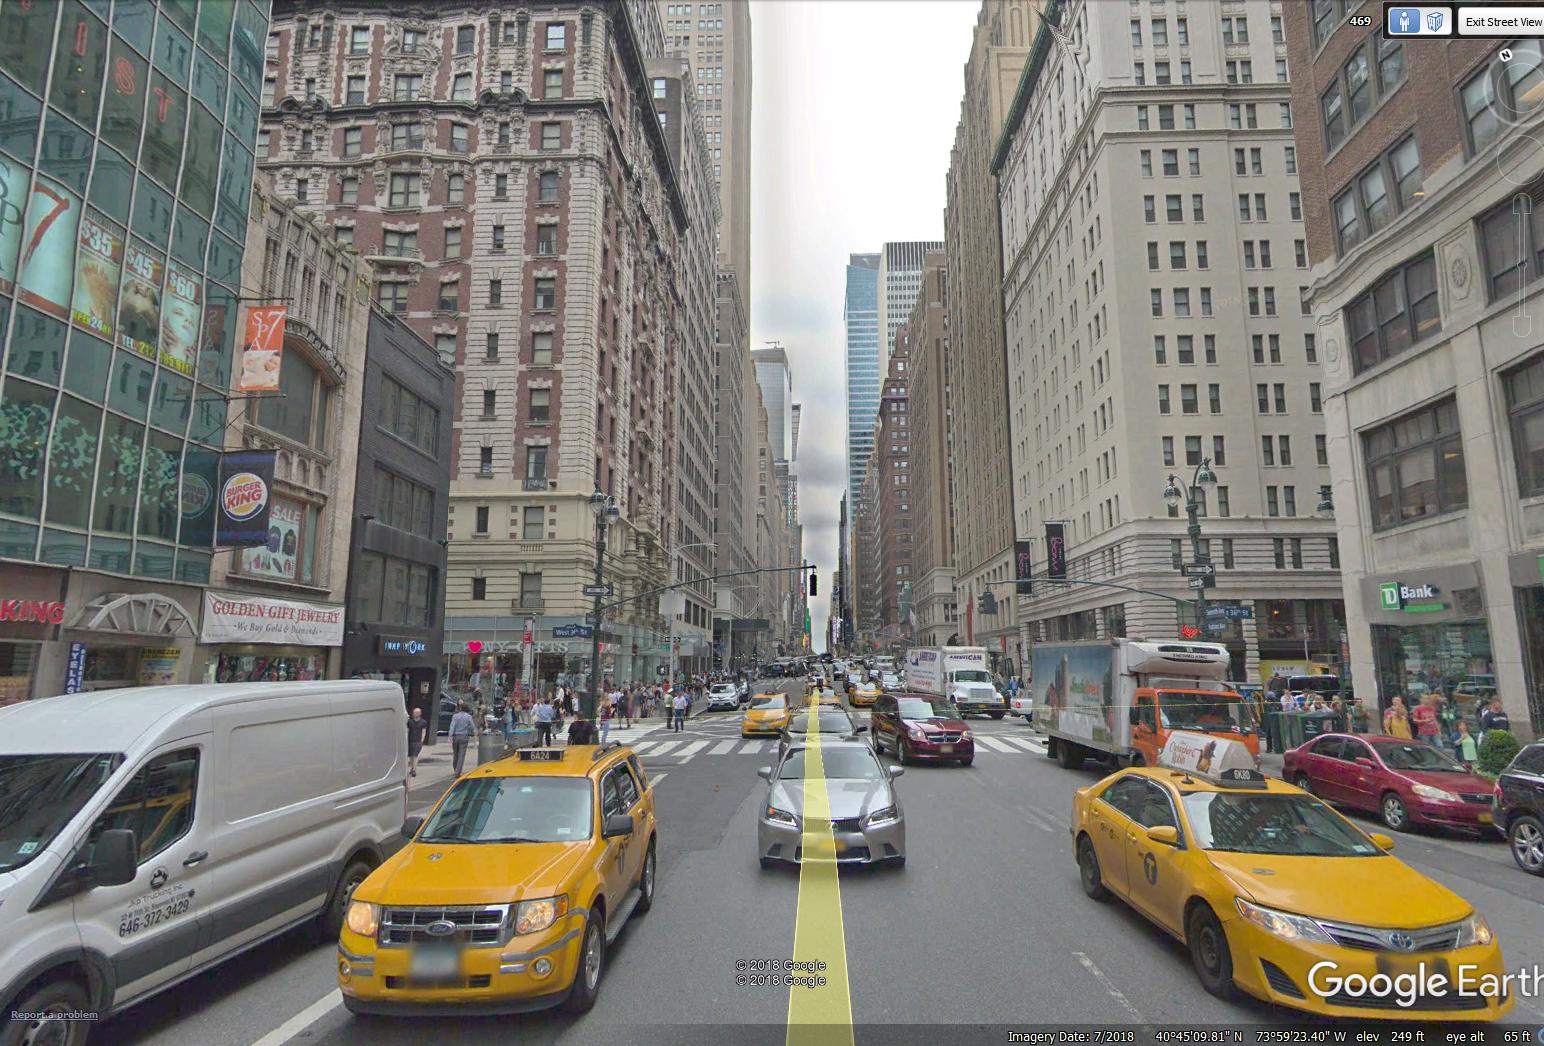 New York, New York (United States)